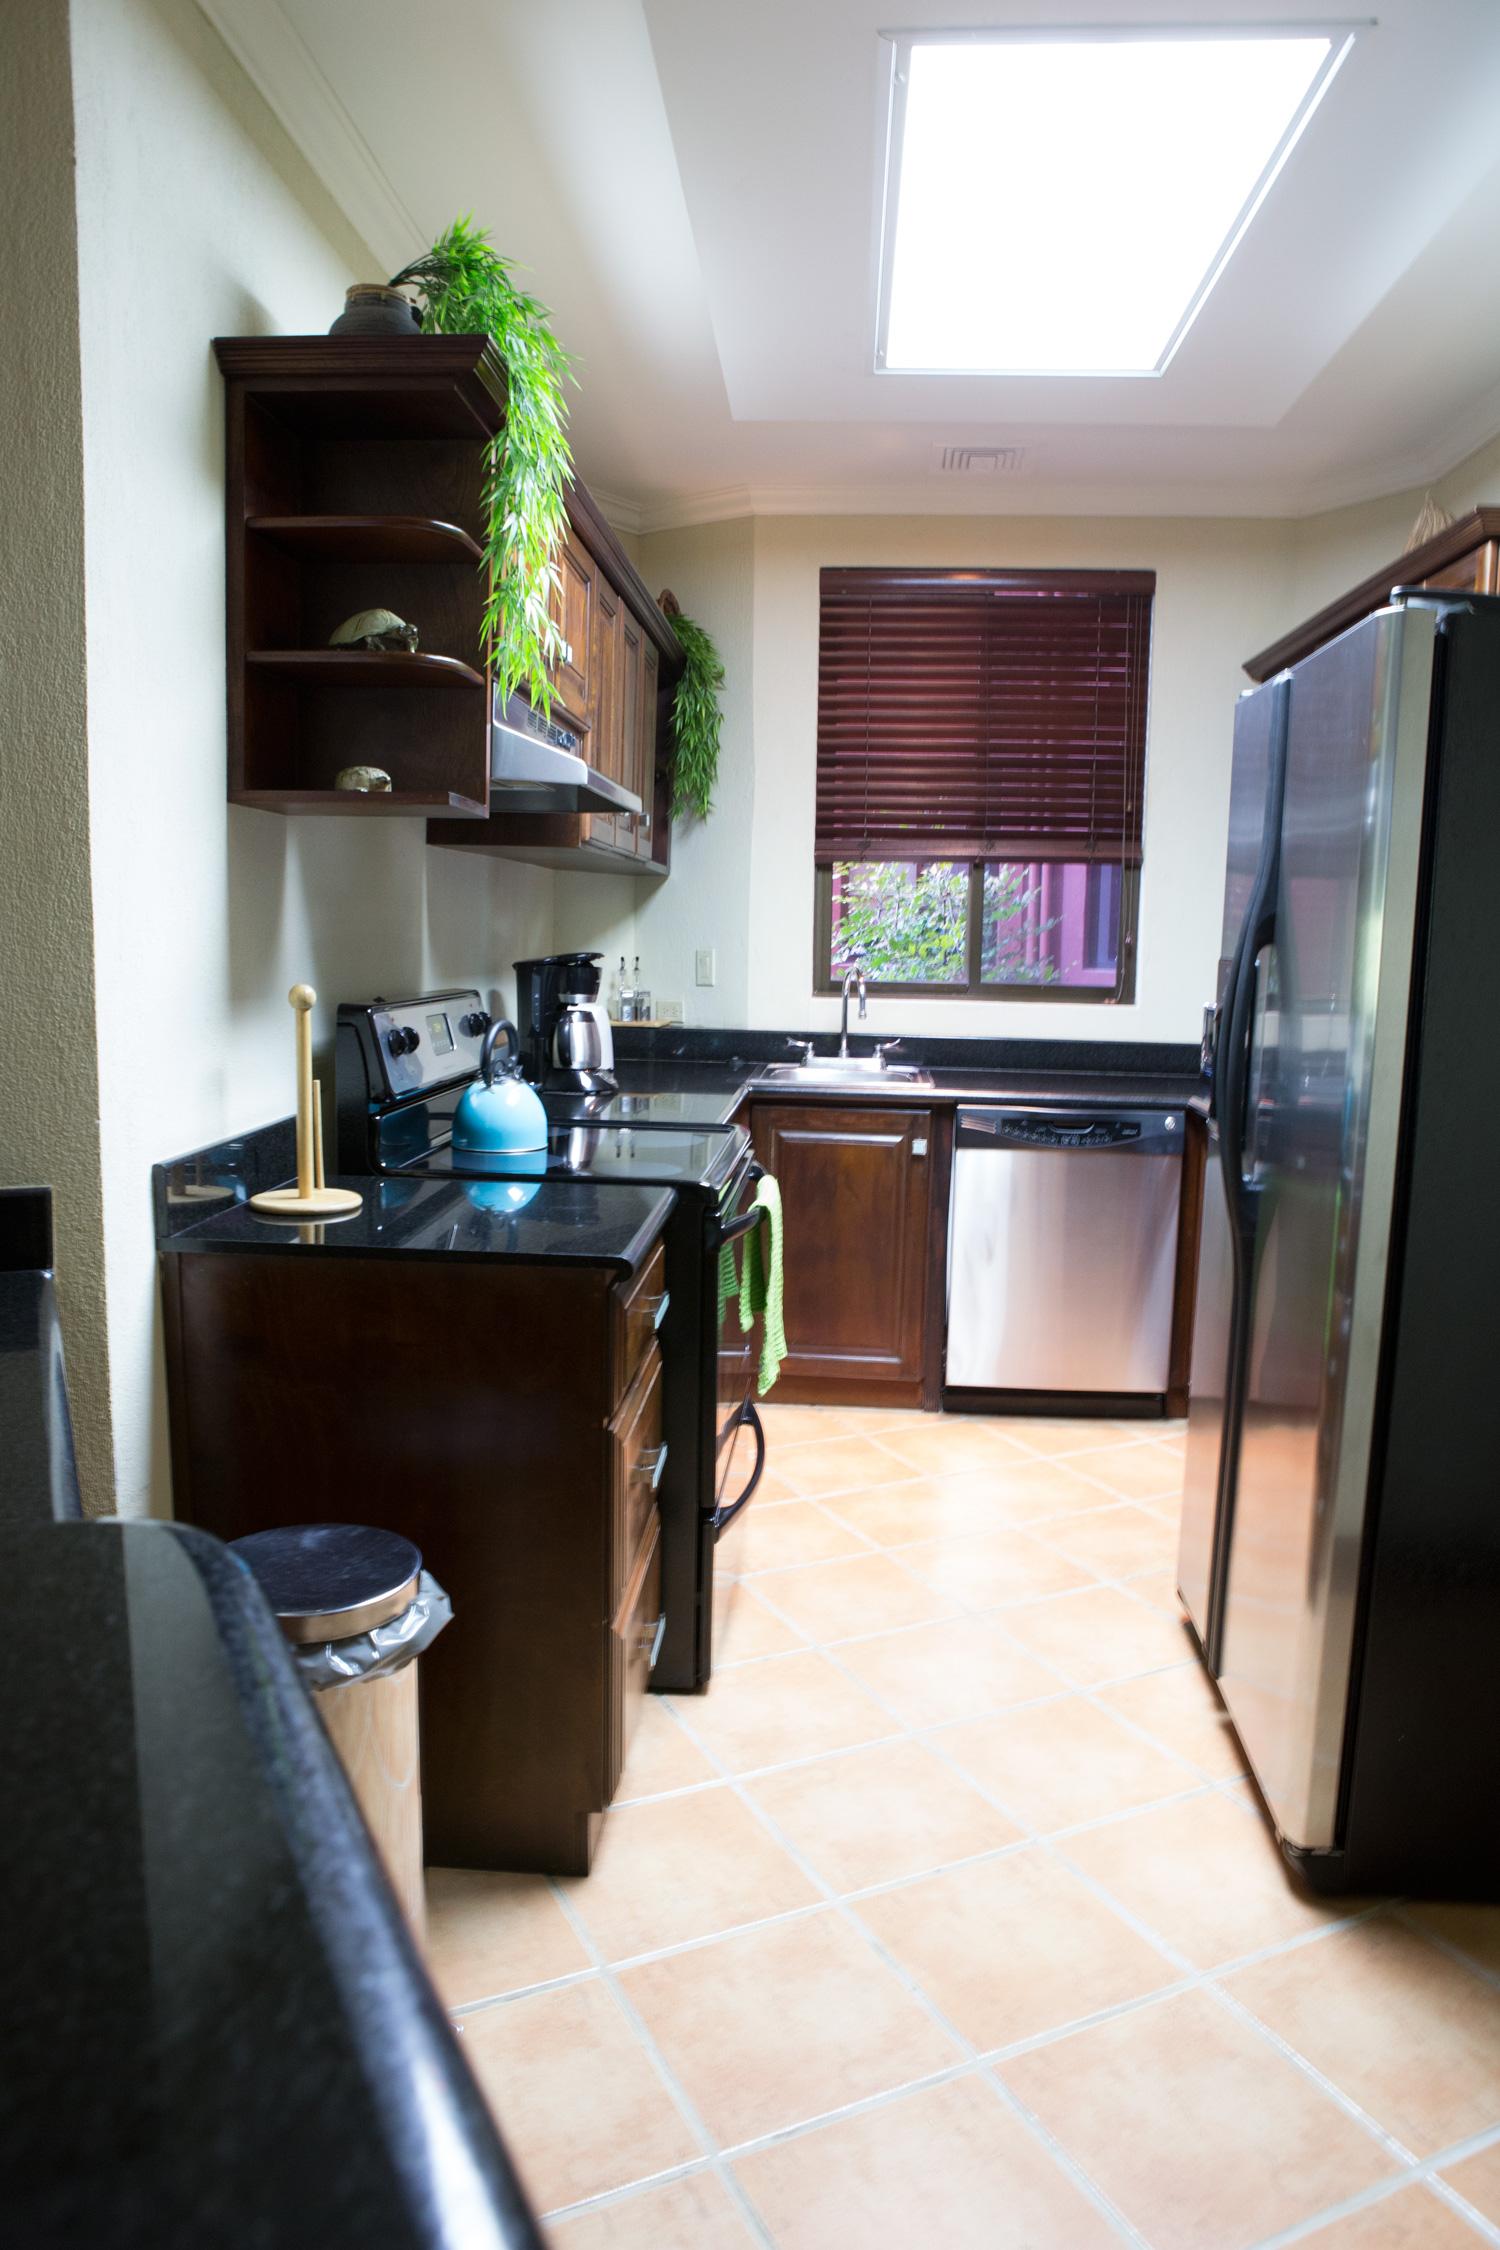 Kitchen at Reserva Conchal, Costa Rica